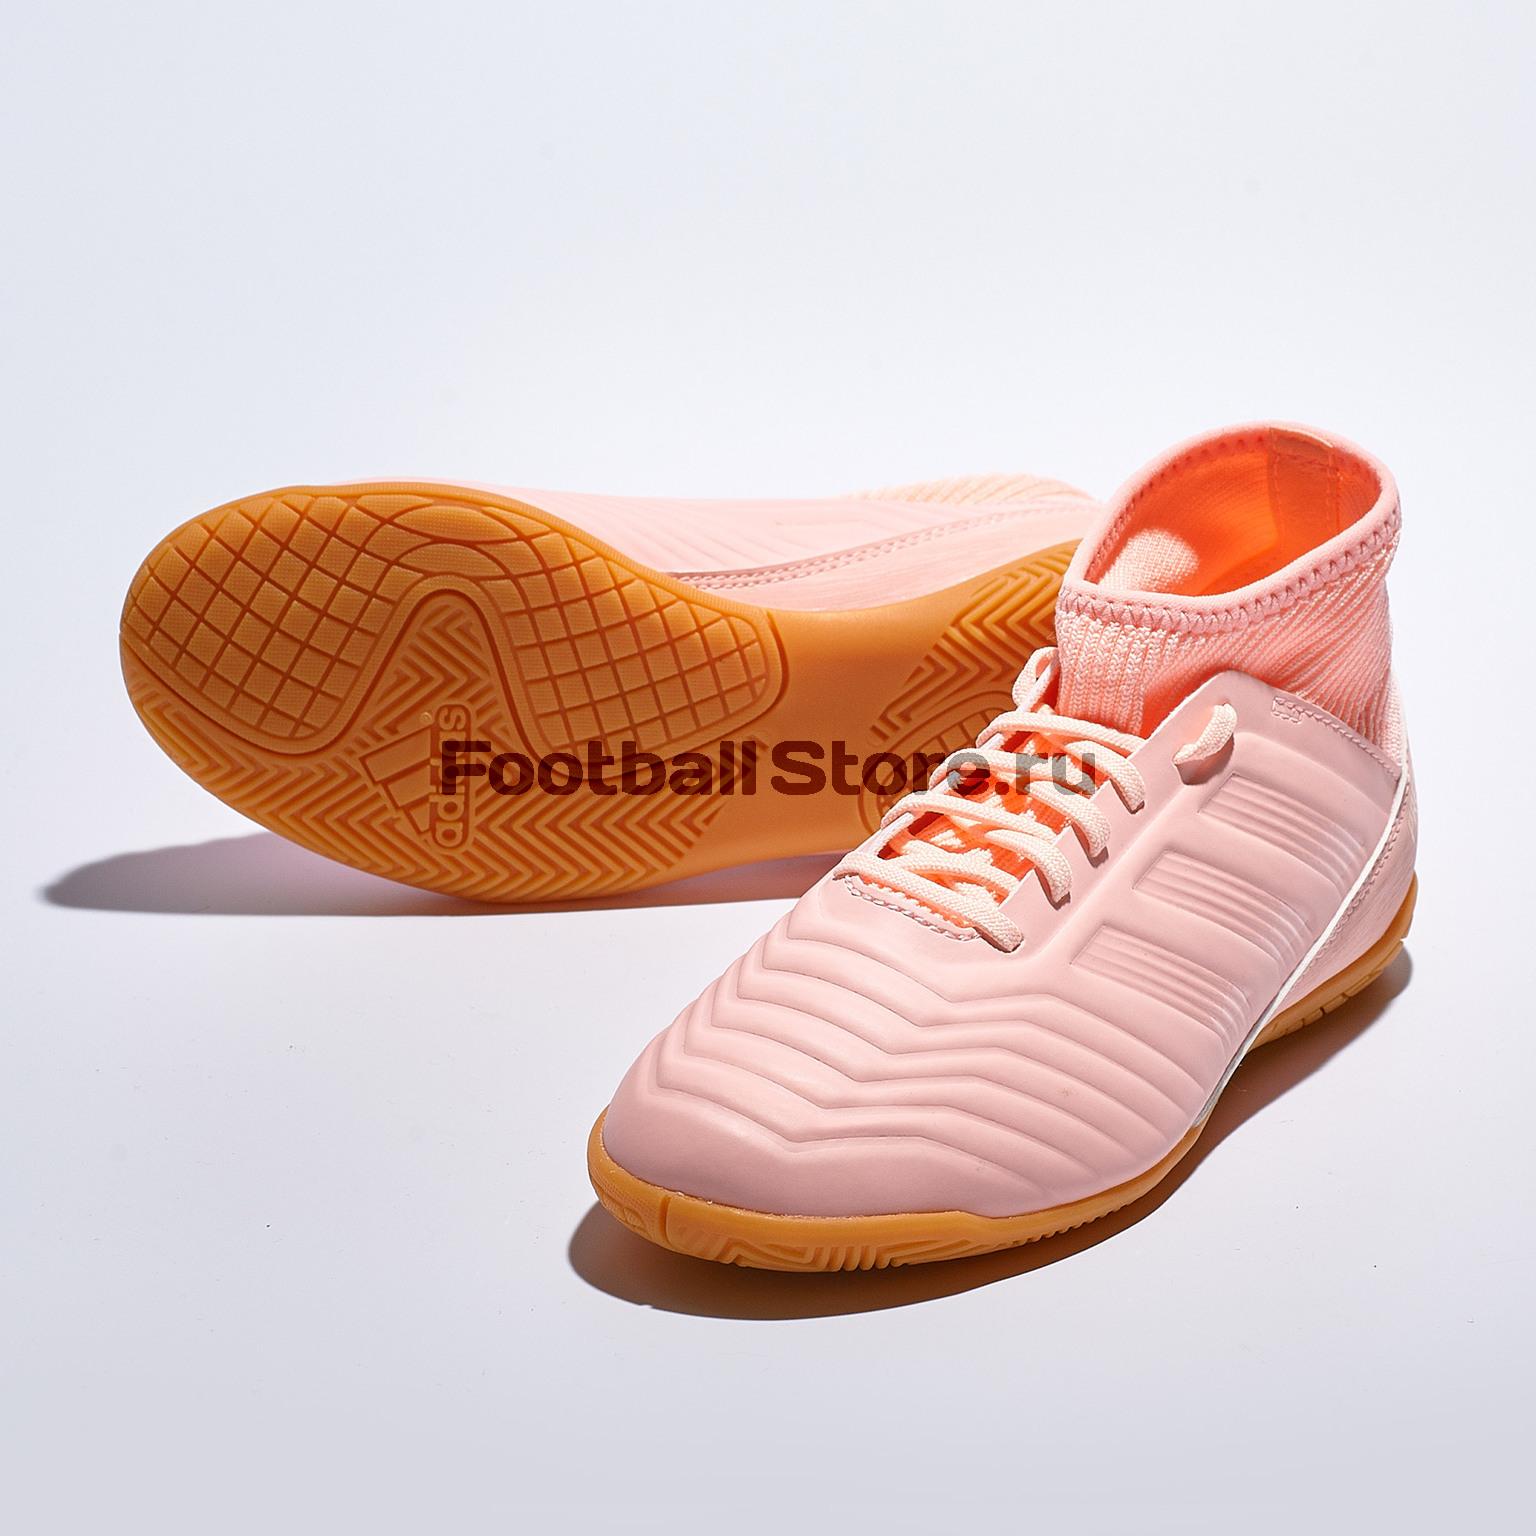 Футзалки детские Adidas Predator Tango 18.3 IN DB2325 цена